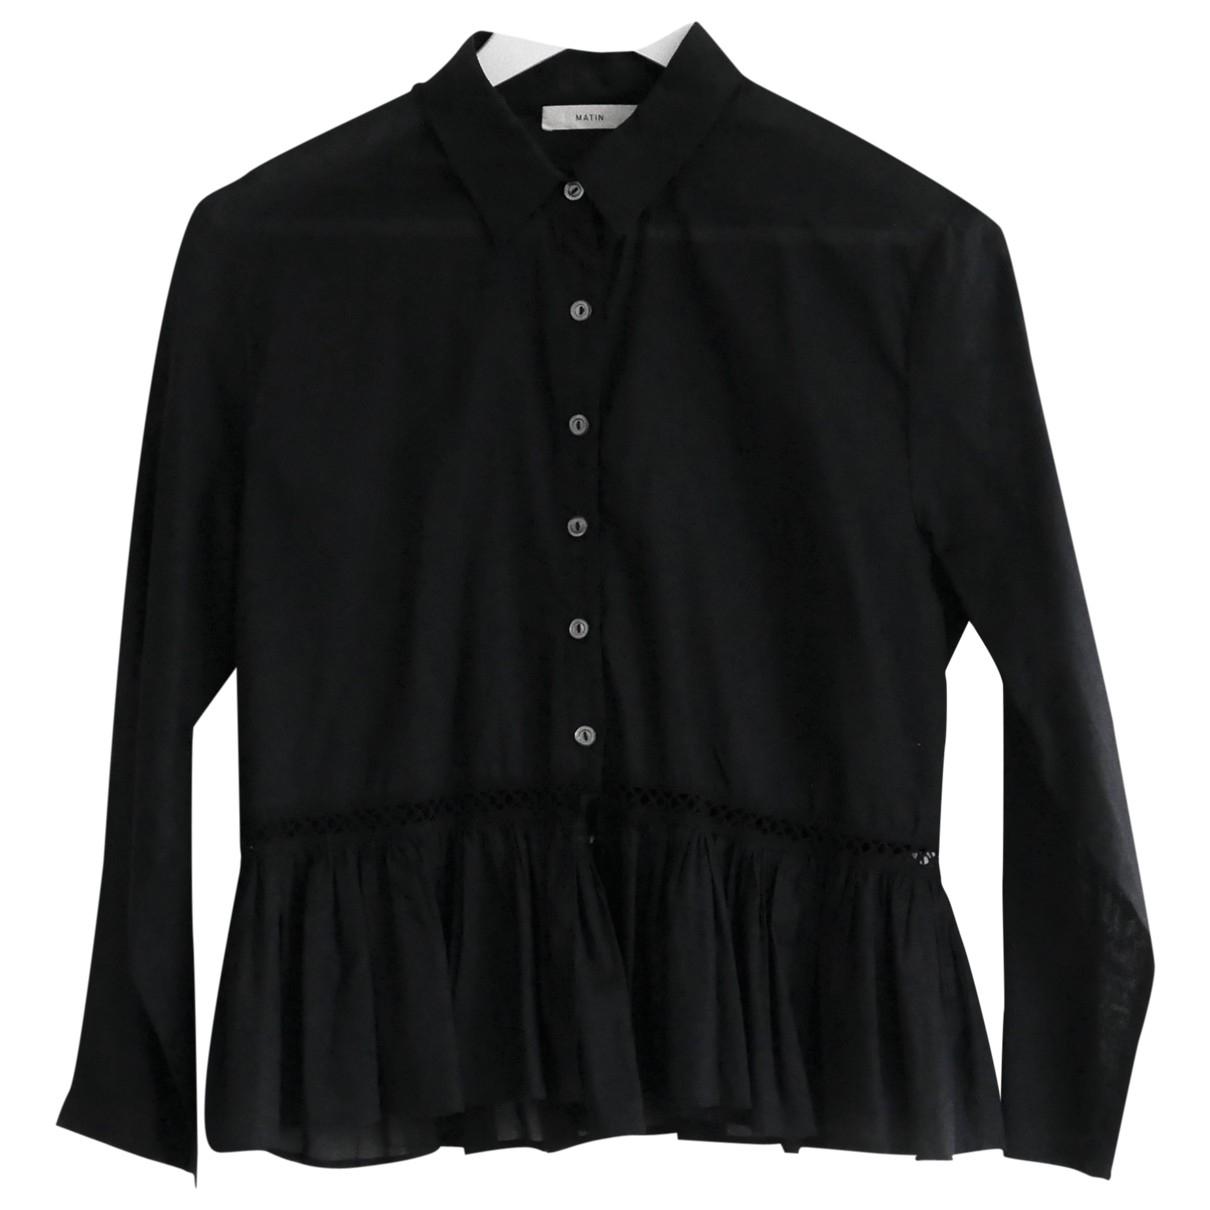 Matin \N Black Cotton  top for Women 8 UK